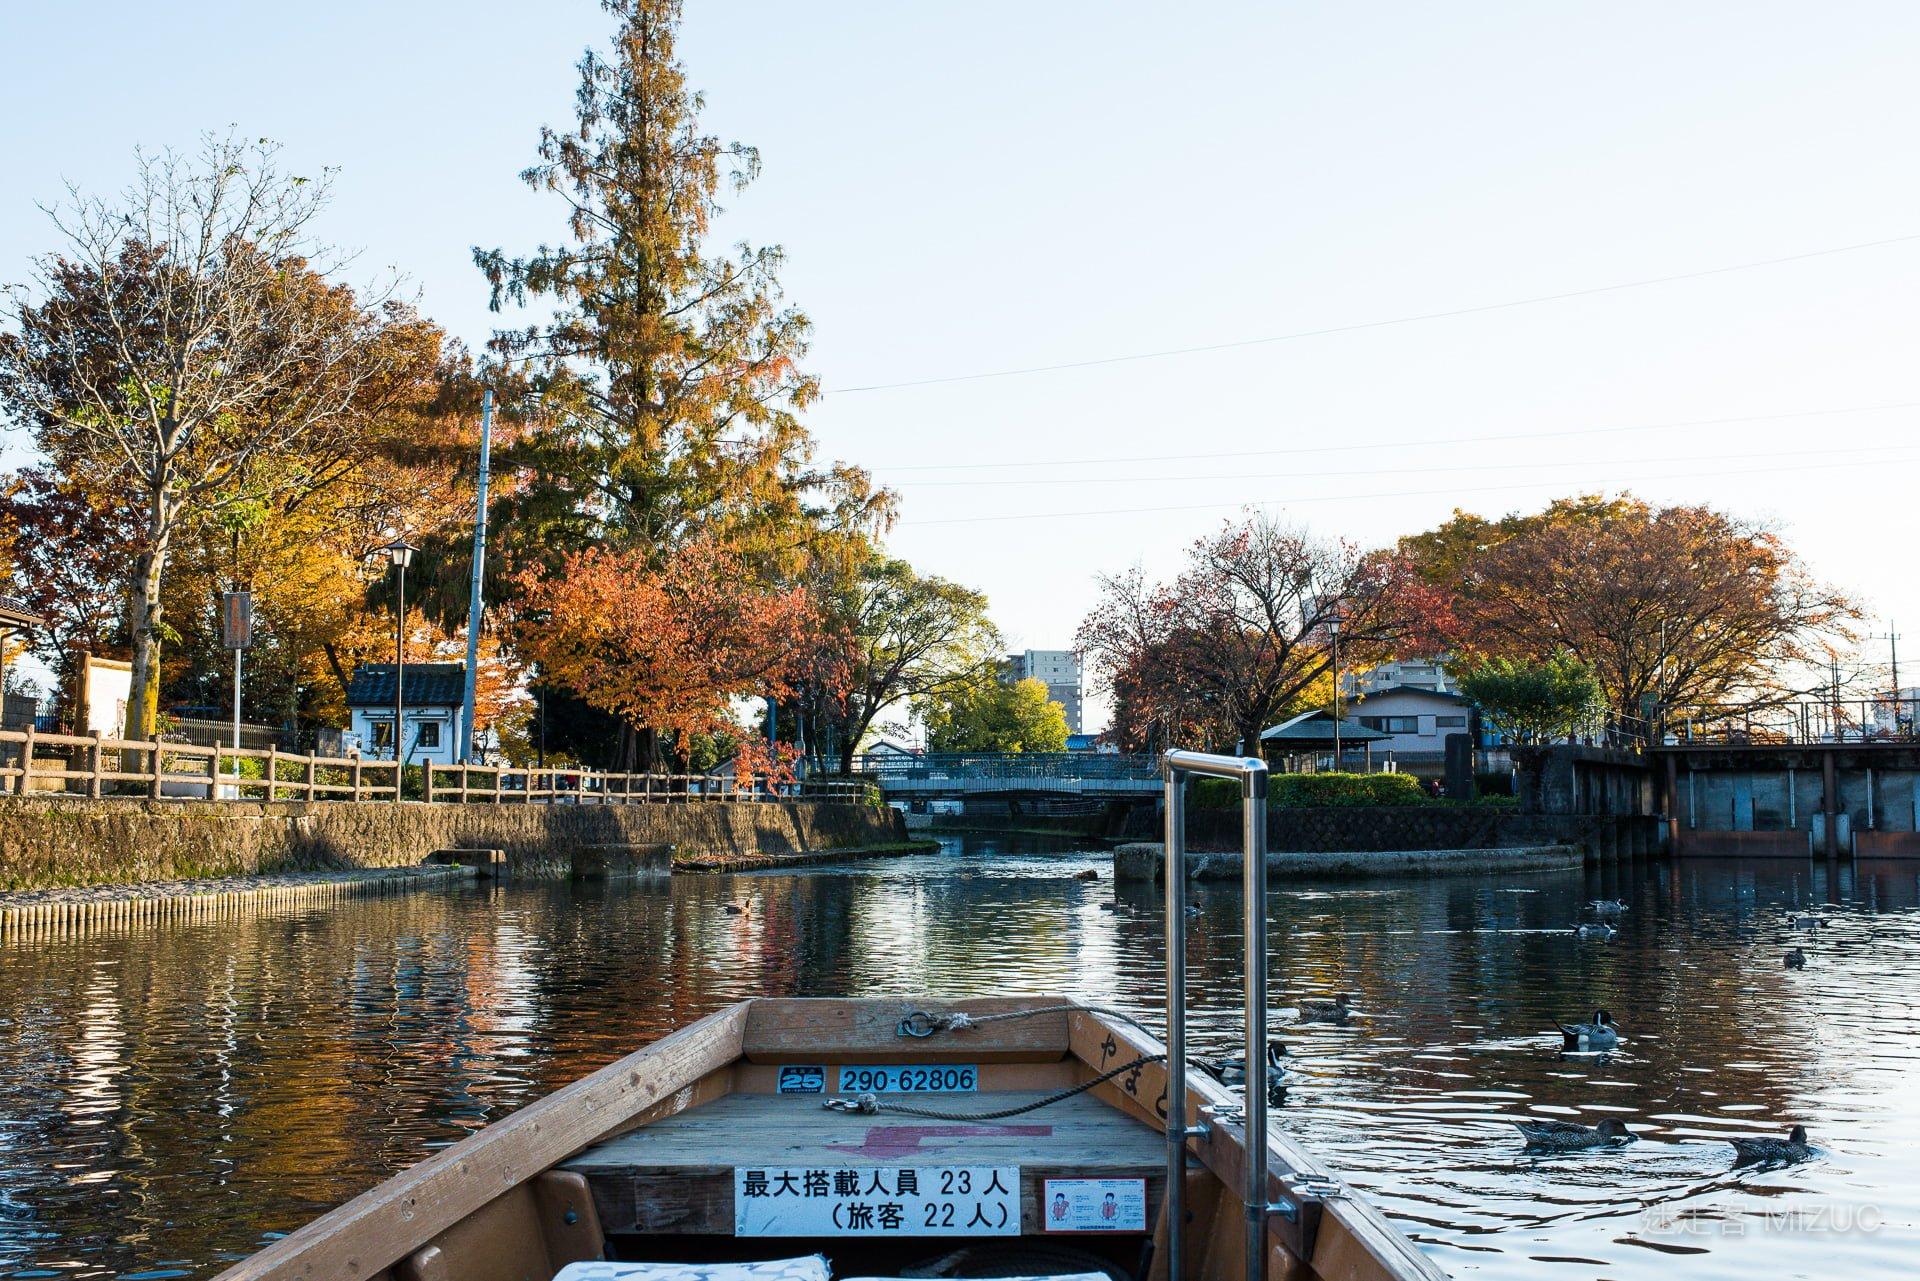 201711 Ibaraki Tochigi Gunma Japan Travel By RentalCar 63 日本自駕旅遊/北關東三縣「茨城、櫪木、群馬」秋天美食、溫泉與瀑布秘境百景(精選照片分享)